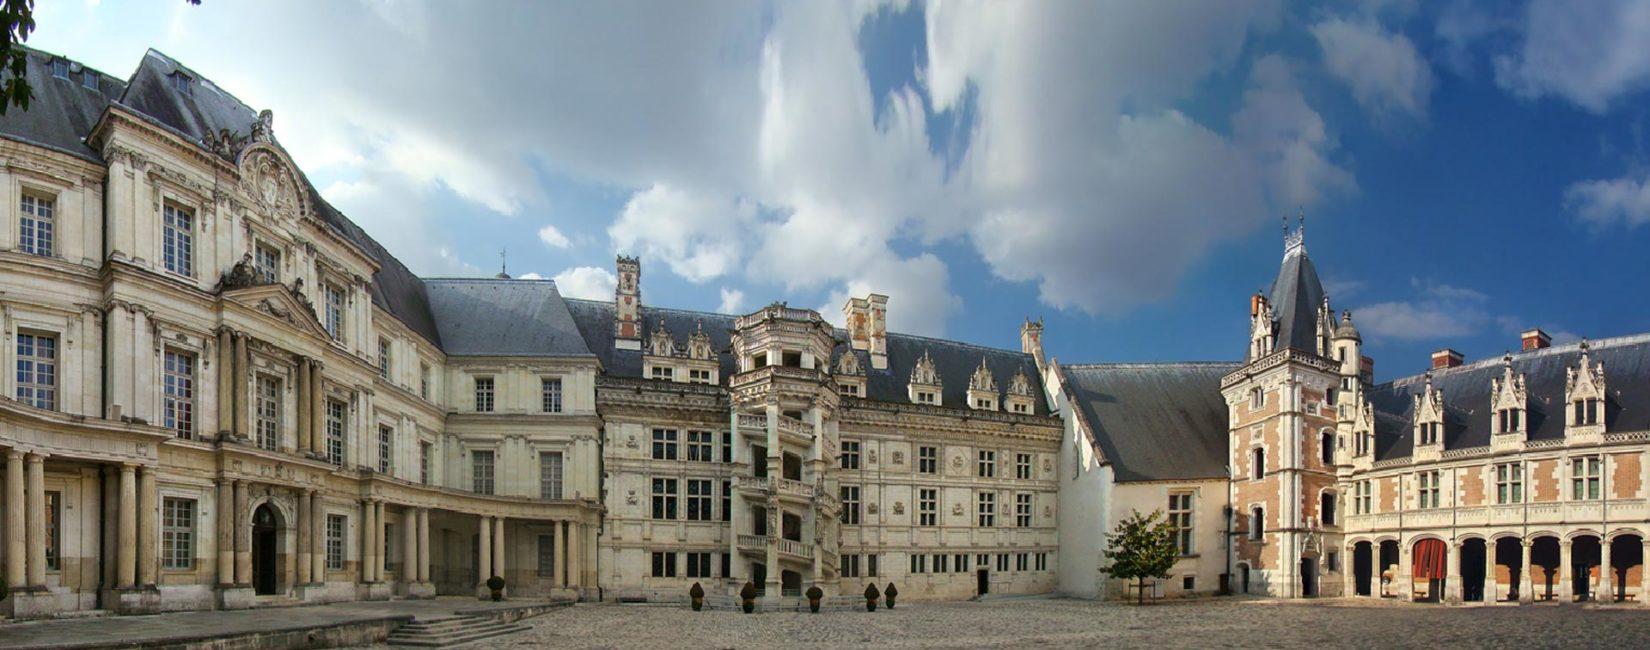 Les voyages en France